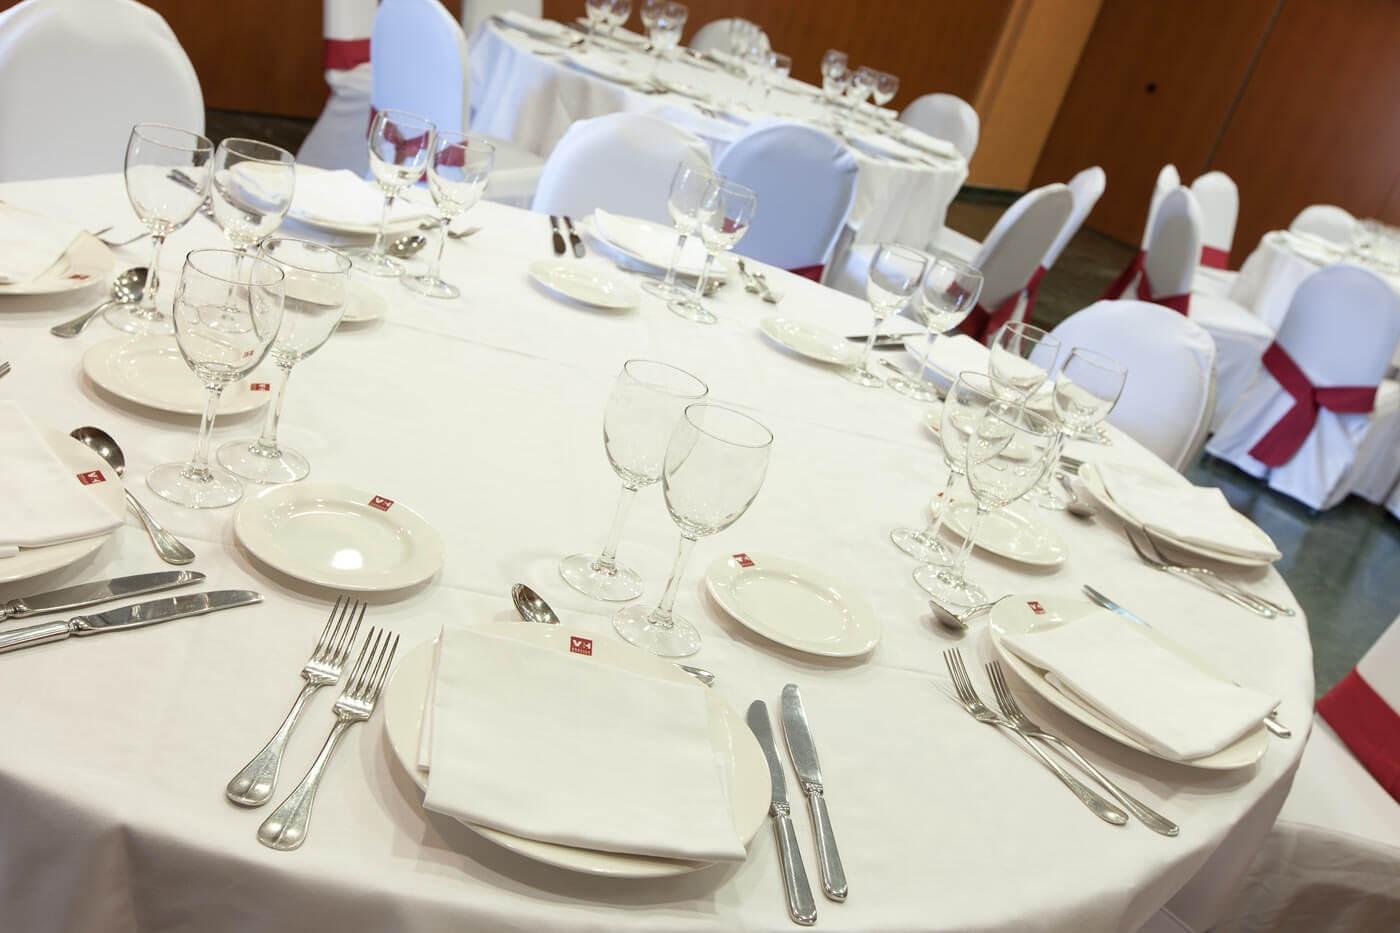 sevilla aljarafe. Hoteles para bodas en Sevilla. Salones de banquetes 5